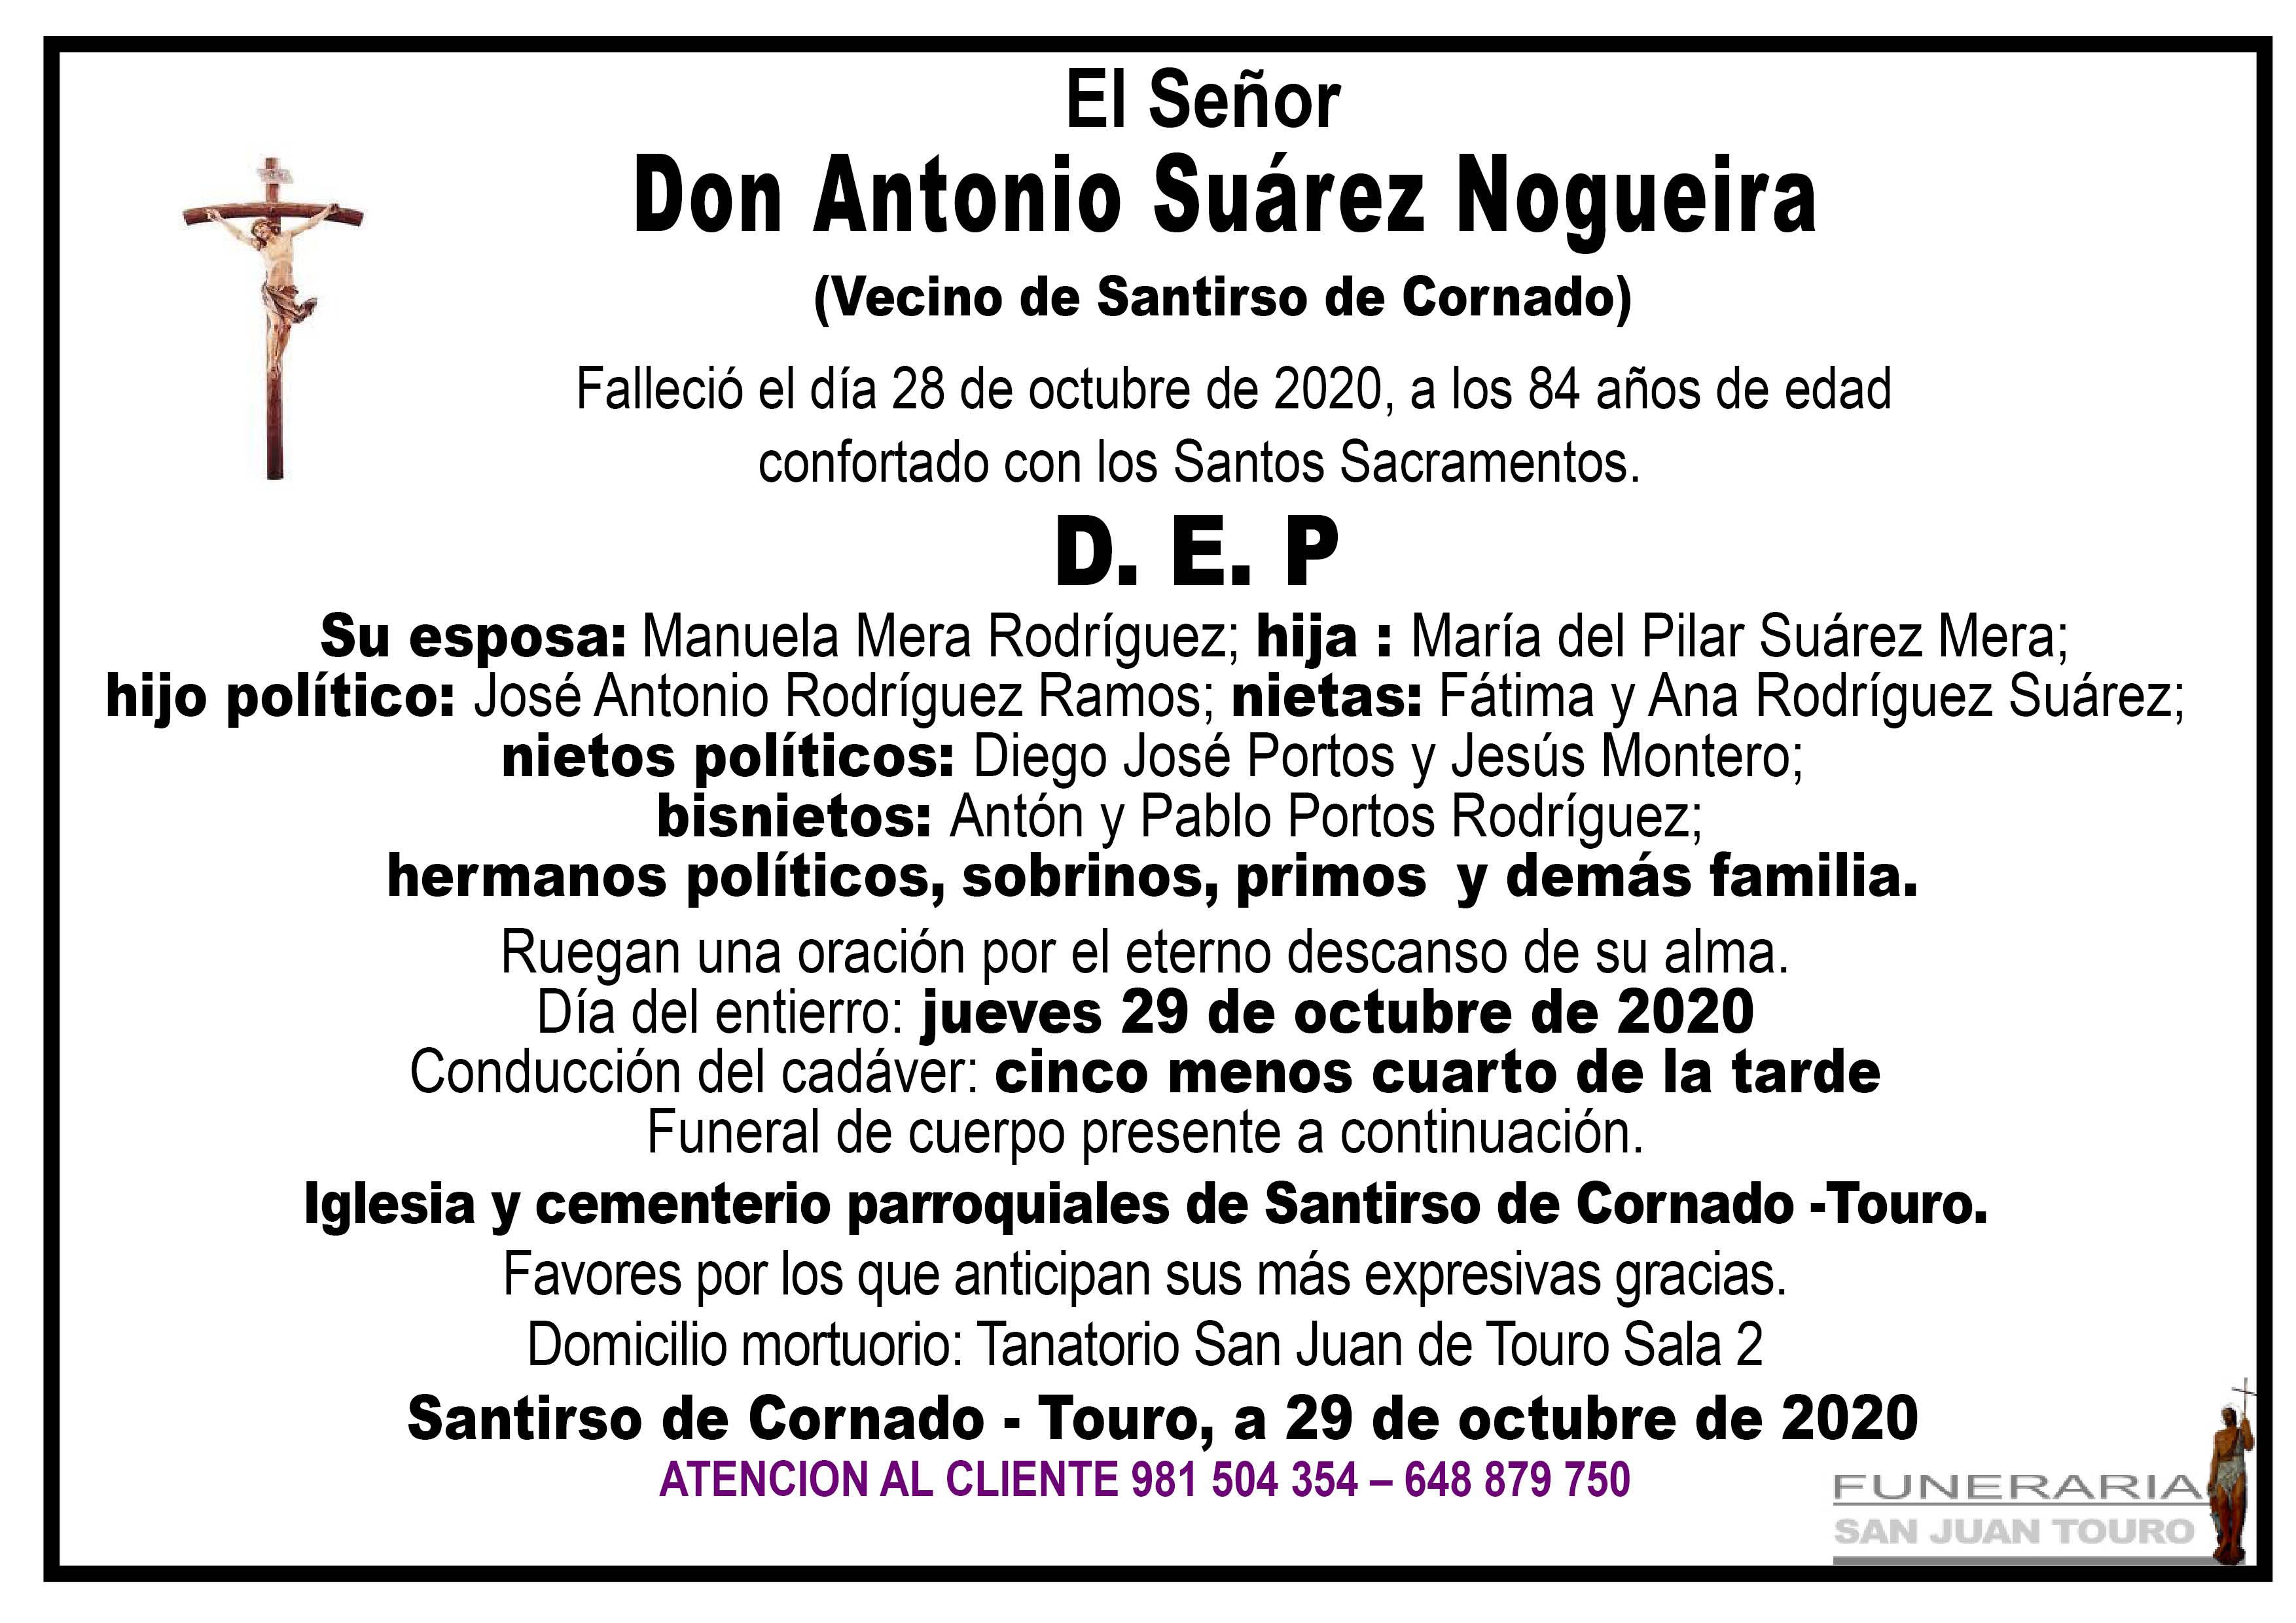 Esquela de SEPELIO DE DON ANTONIO SUÁREZ NOGUEIRA